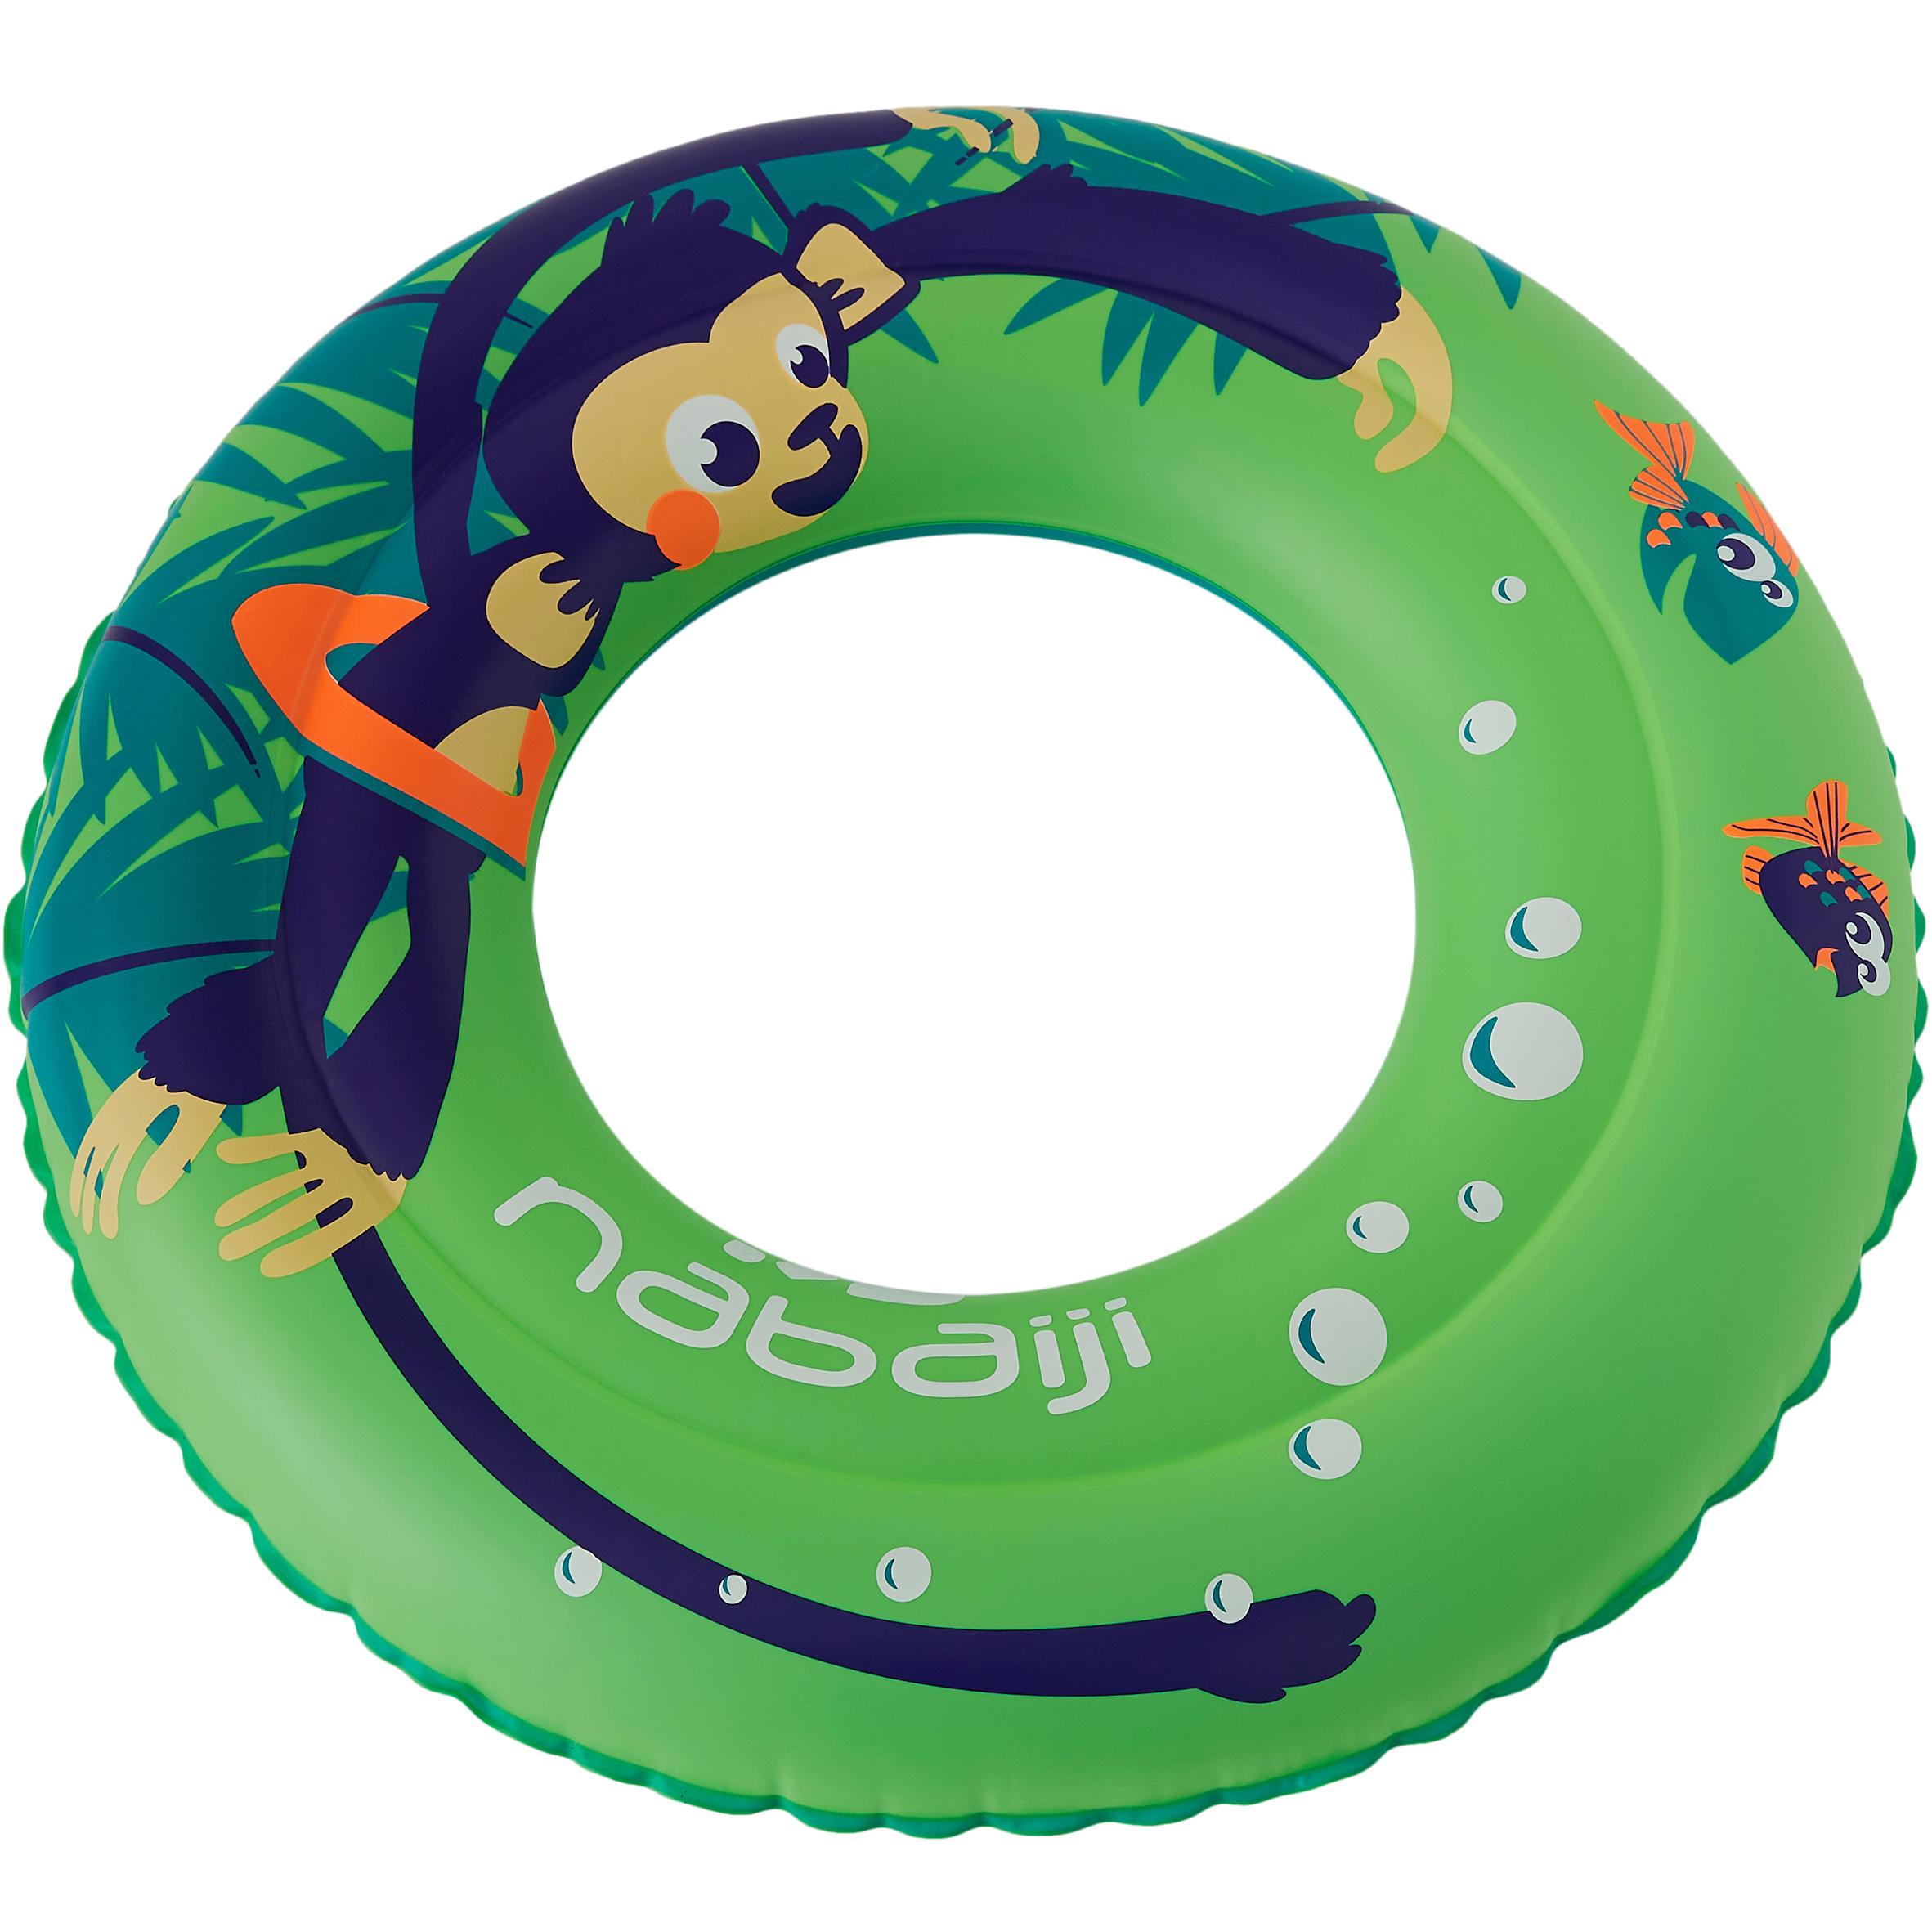 Children's inflatable swim ring 3-6 years 51 cm - Monkey print green